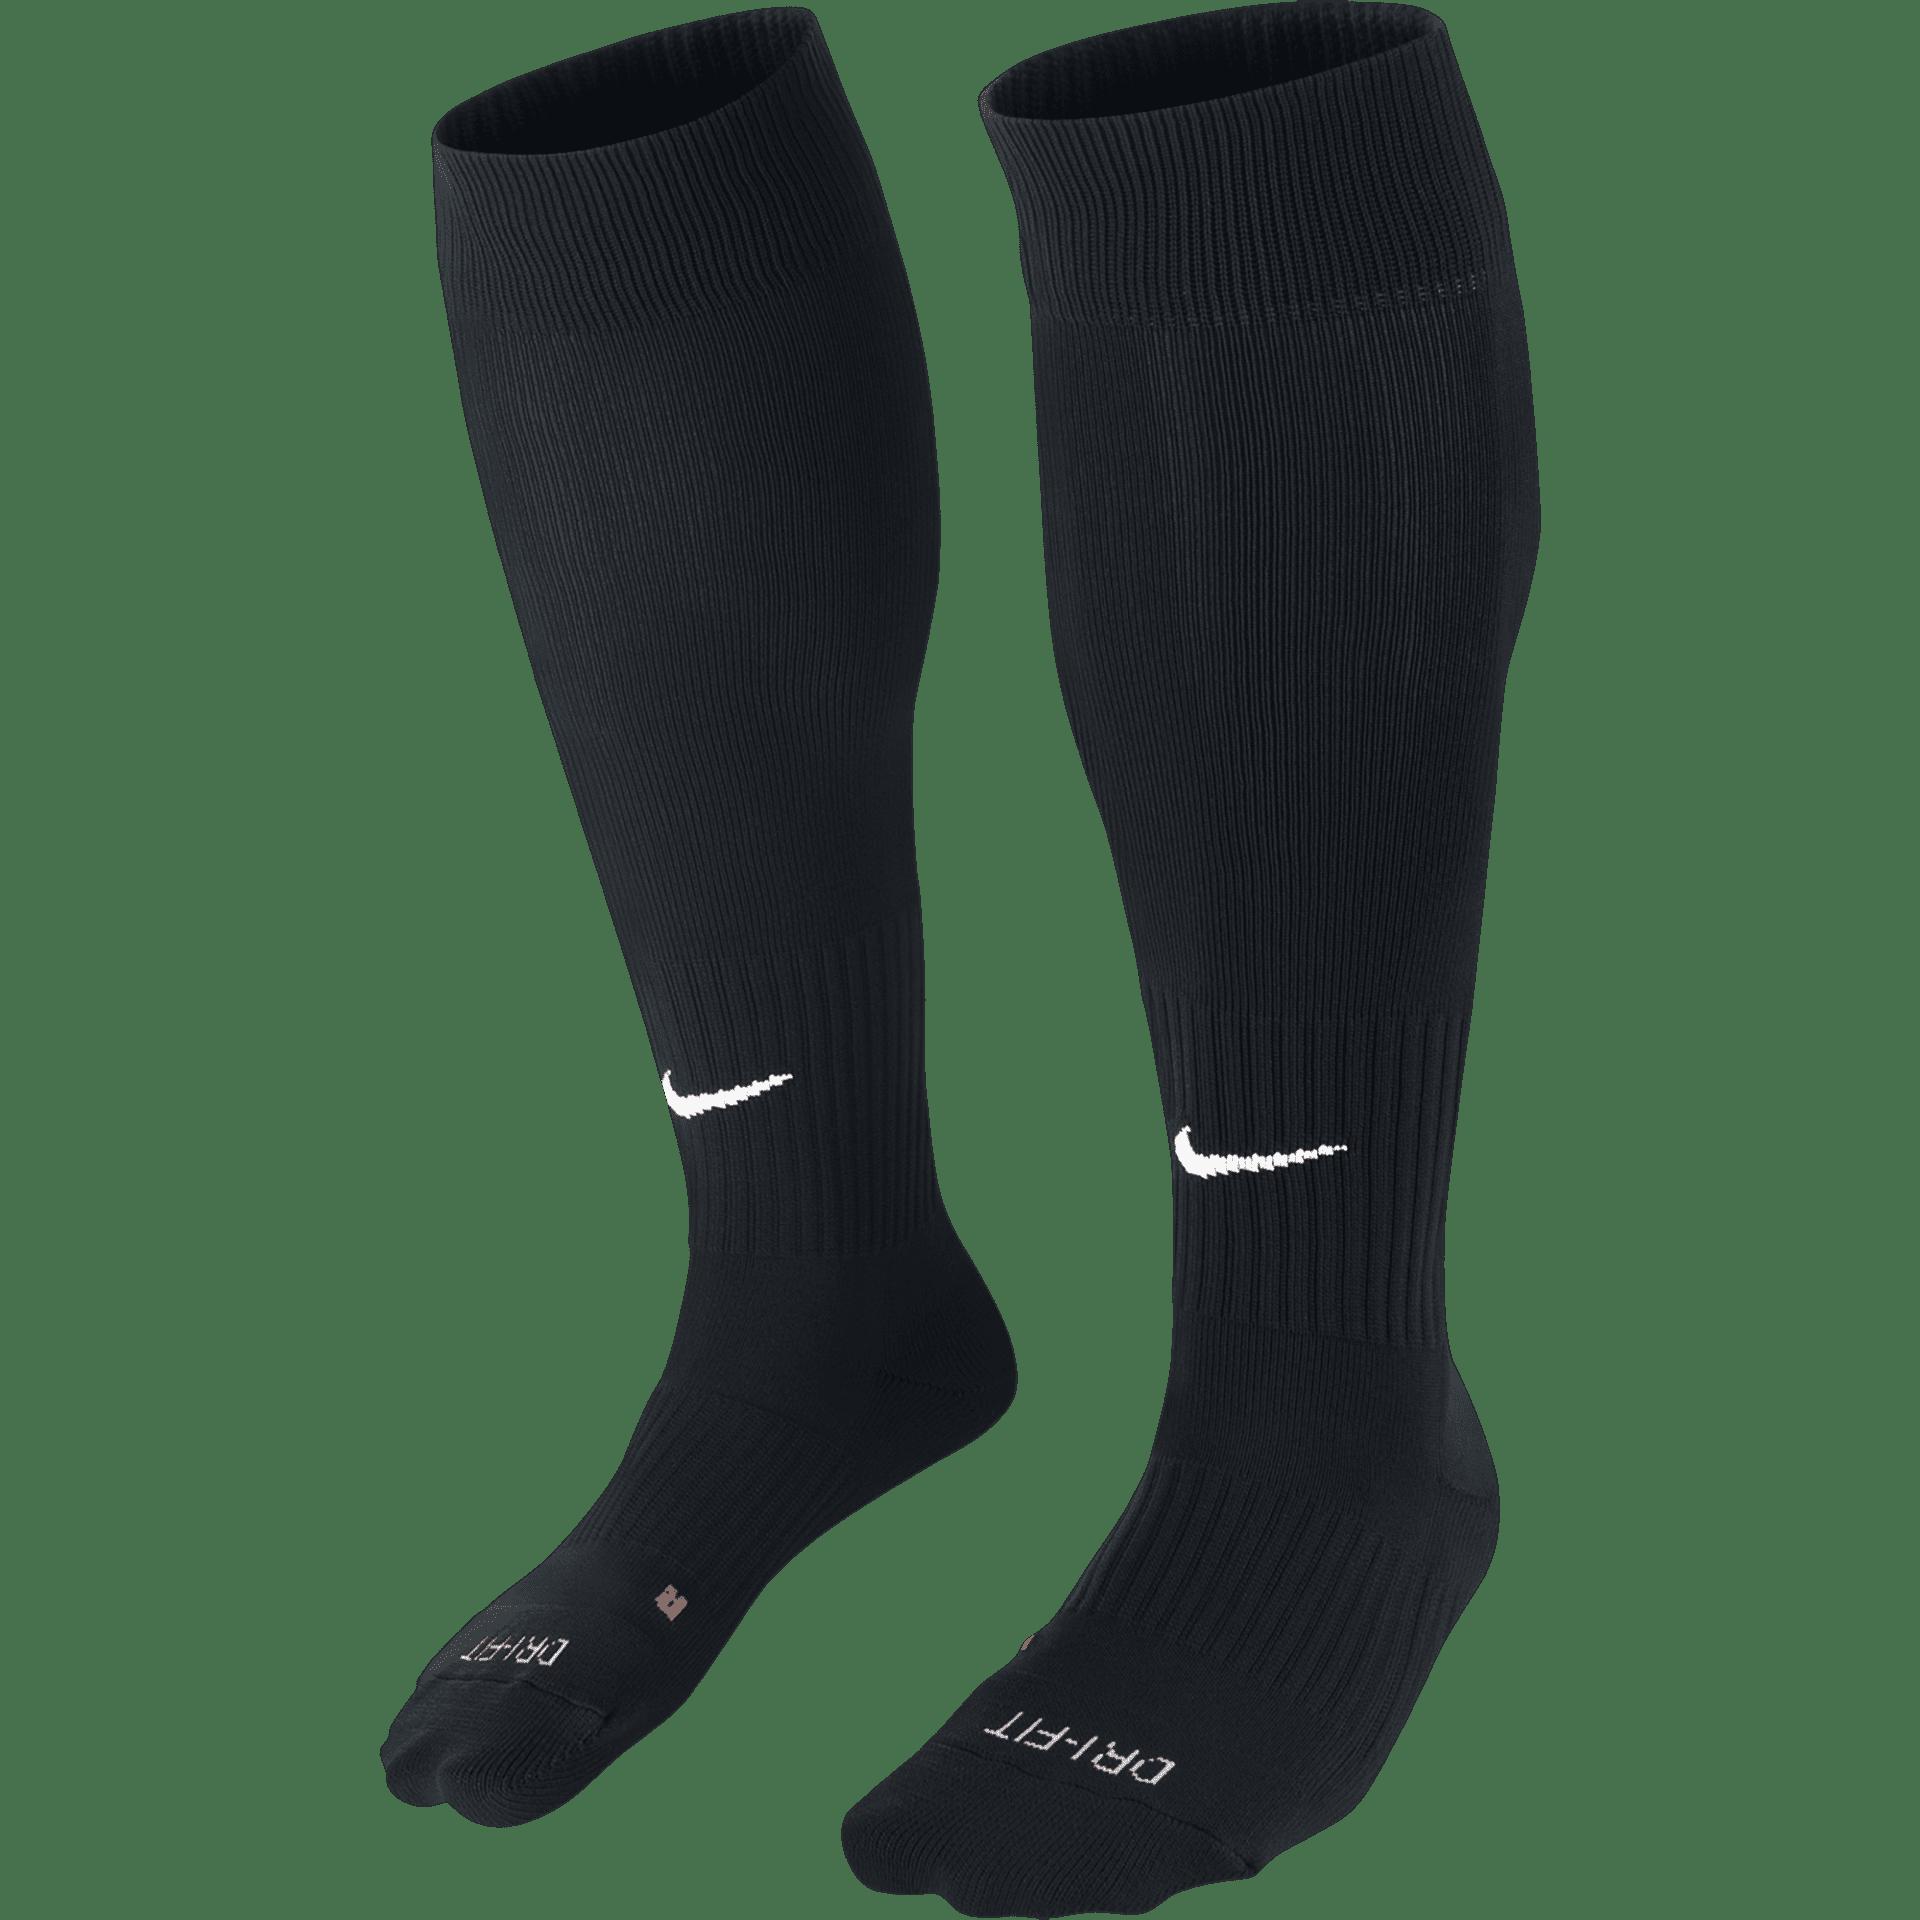 westland fc classic socks size 8 11 34973 p